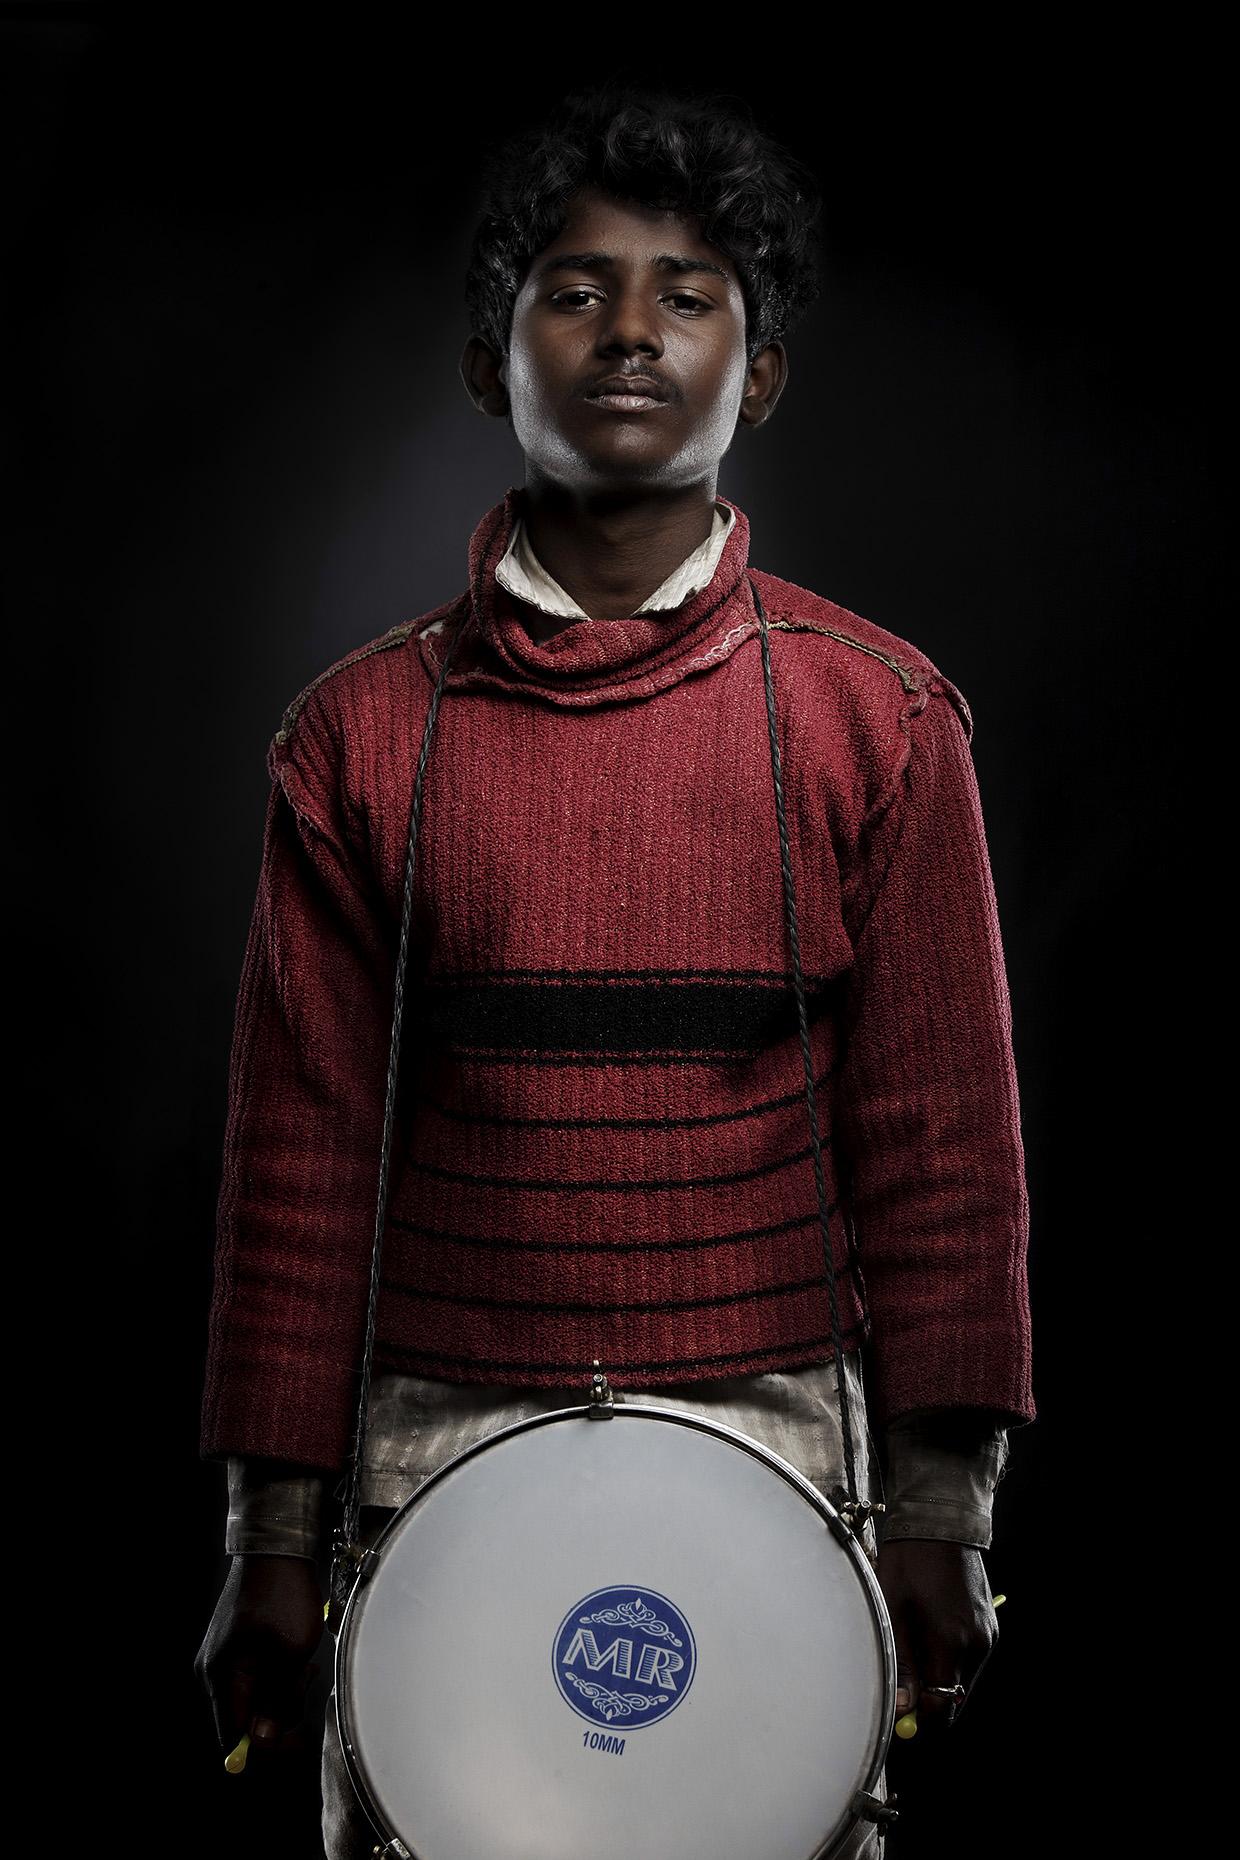 Photo of drummer boy at the Kumbh Mela